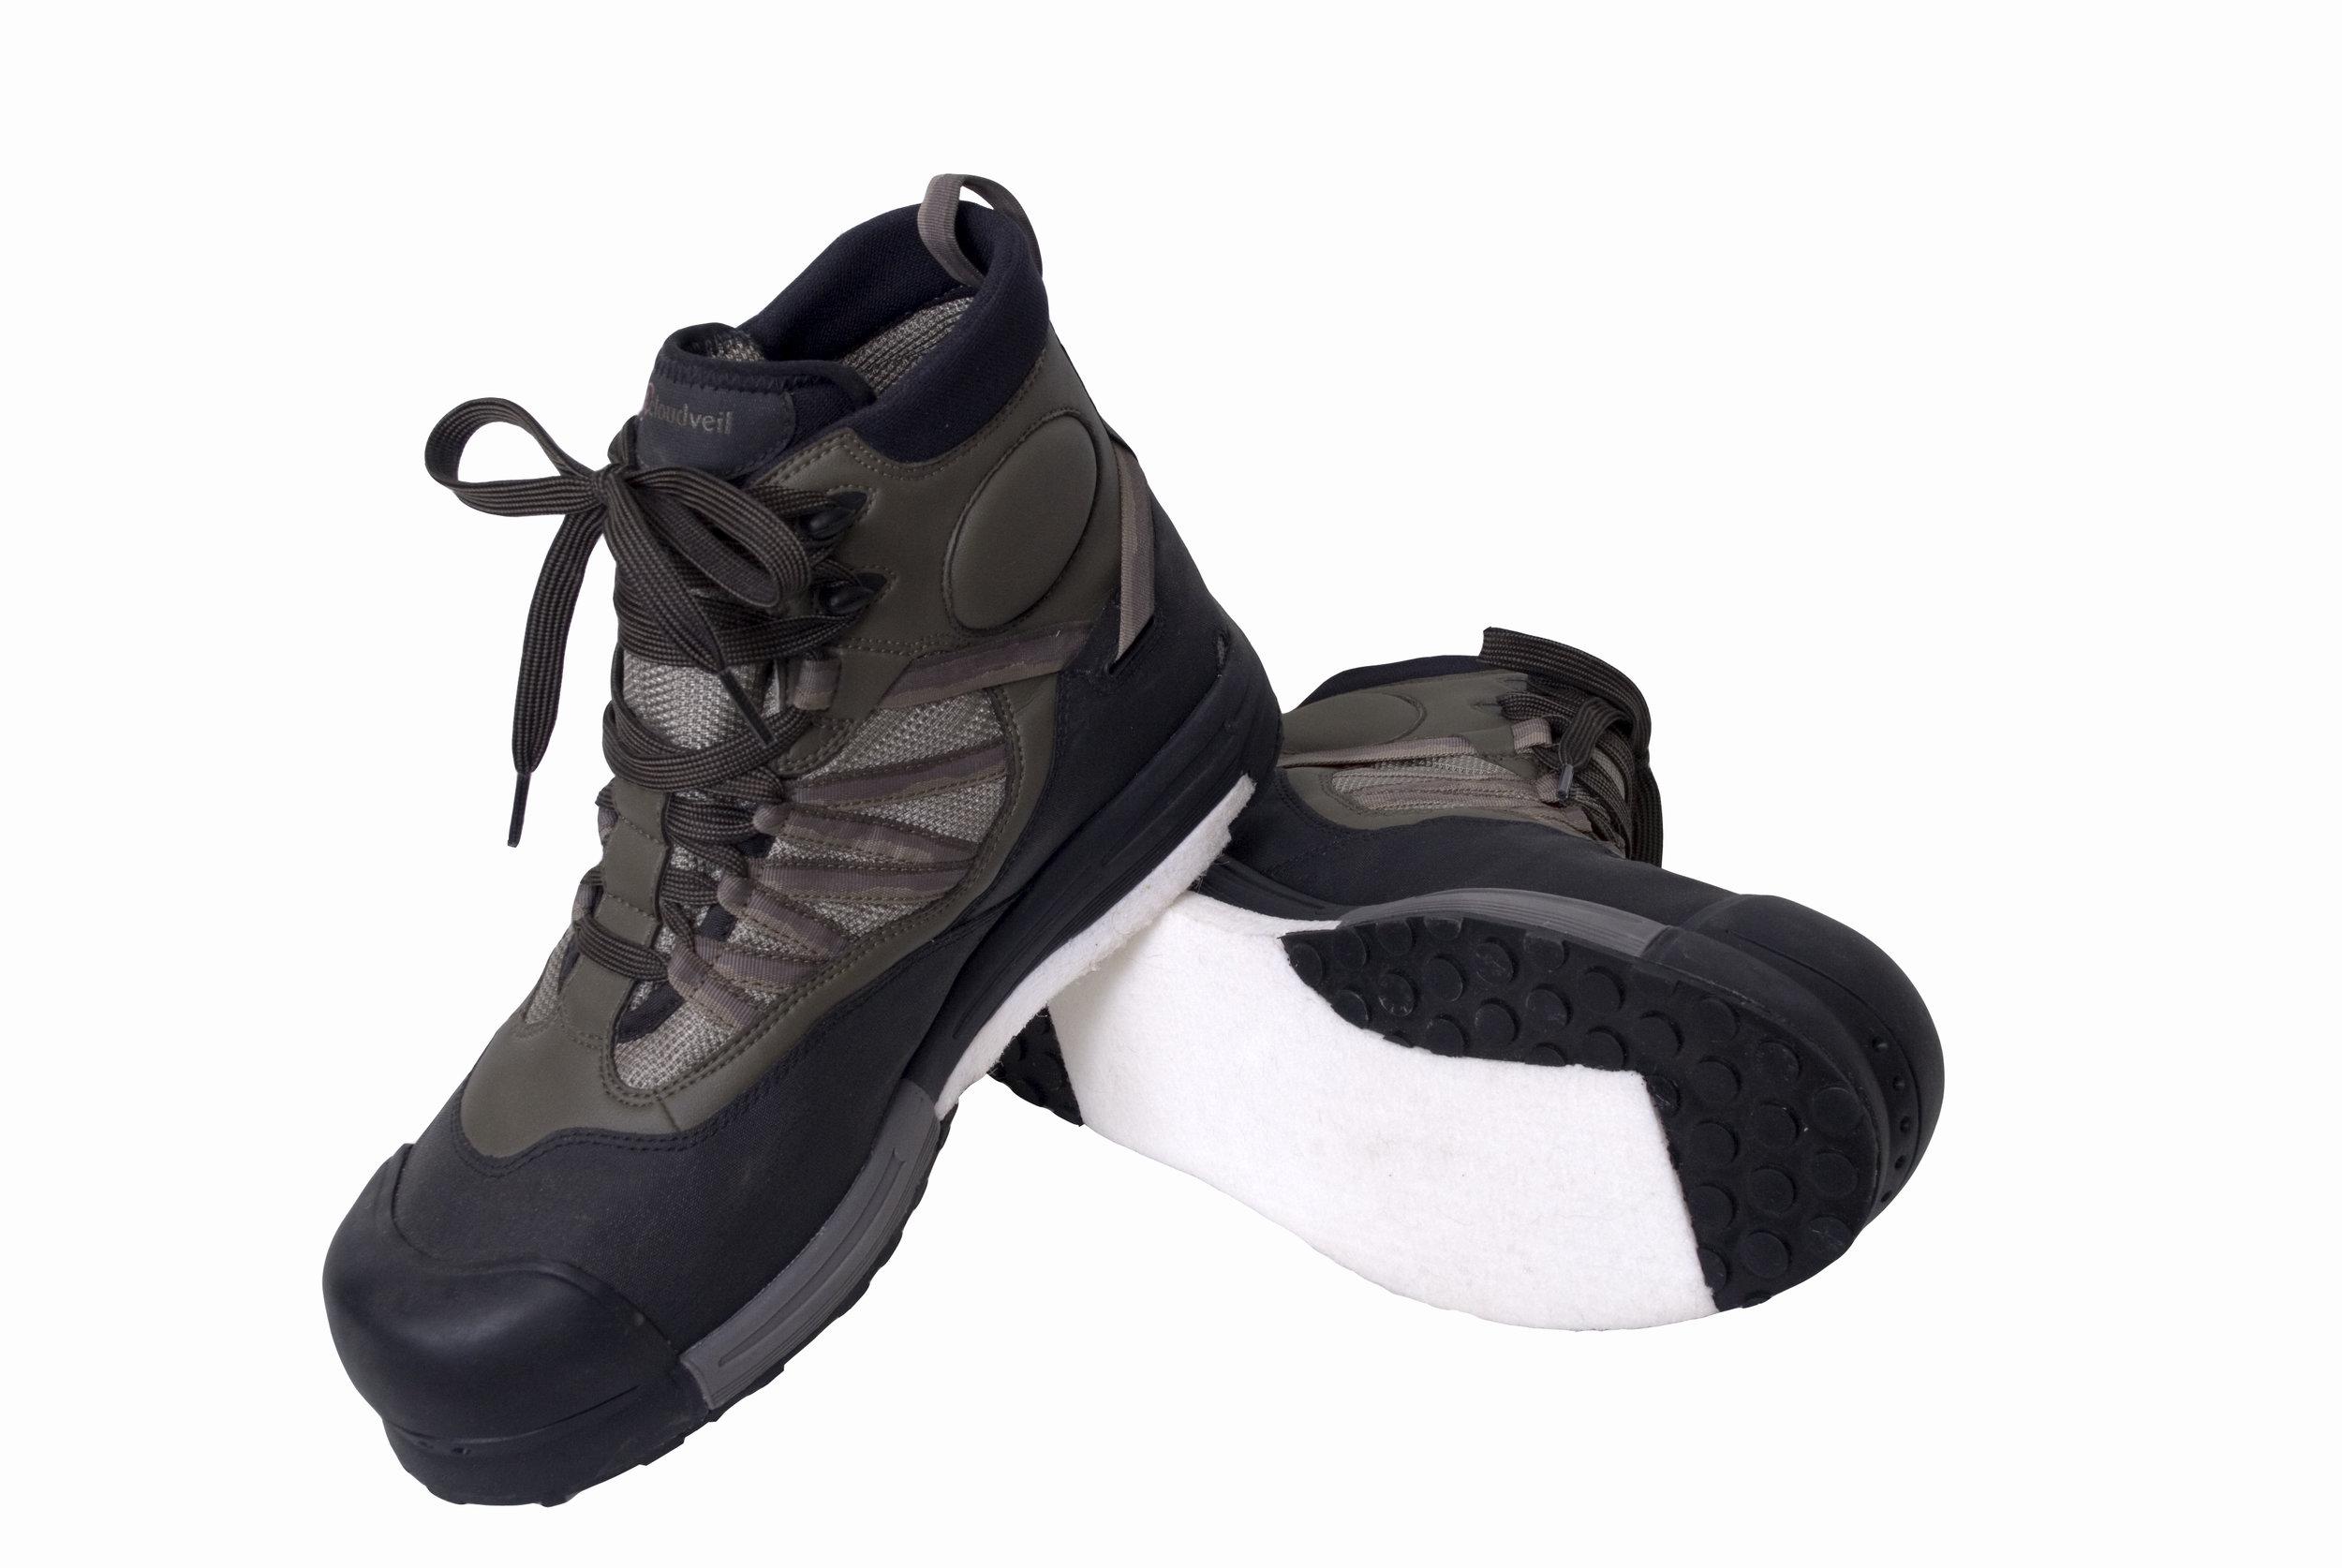 cmw boots.jpg